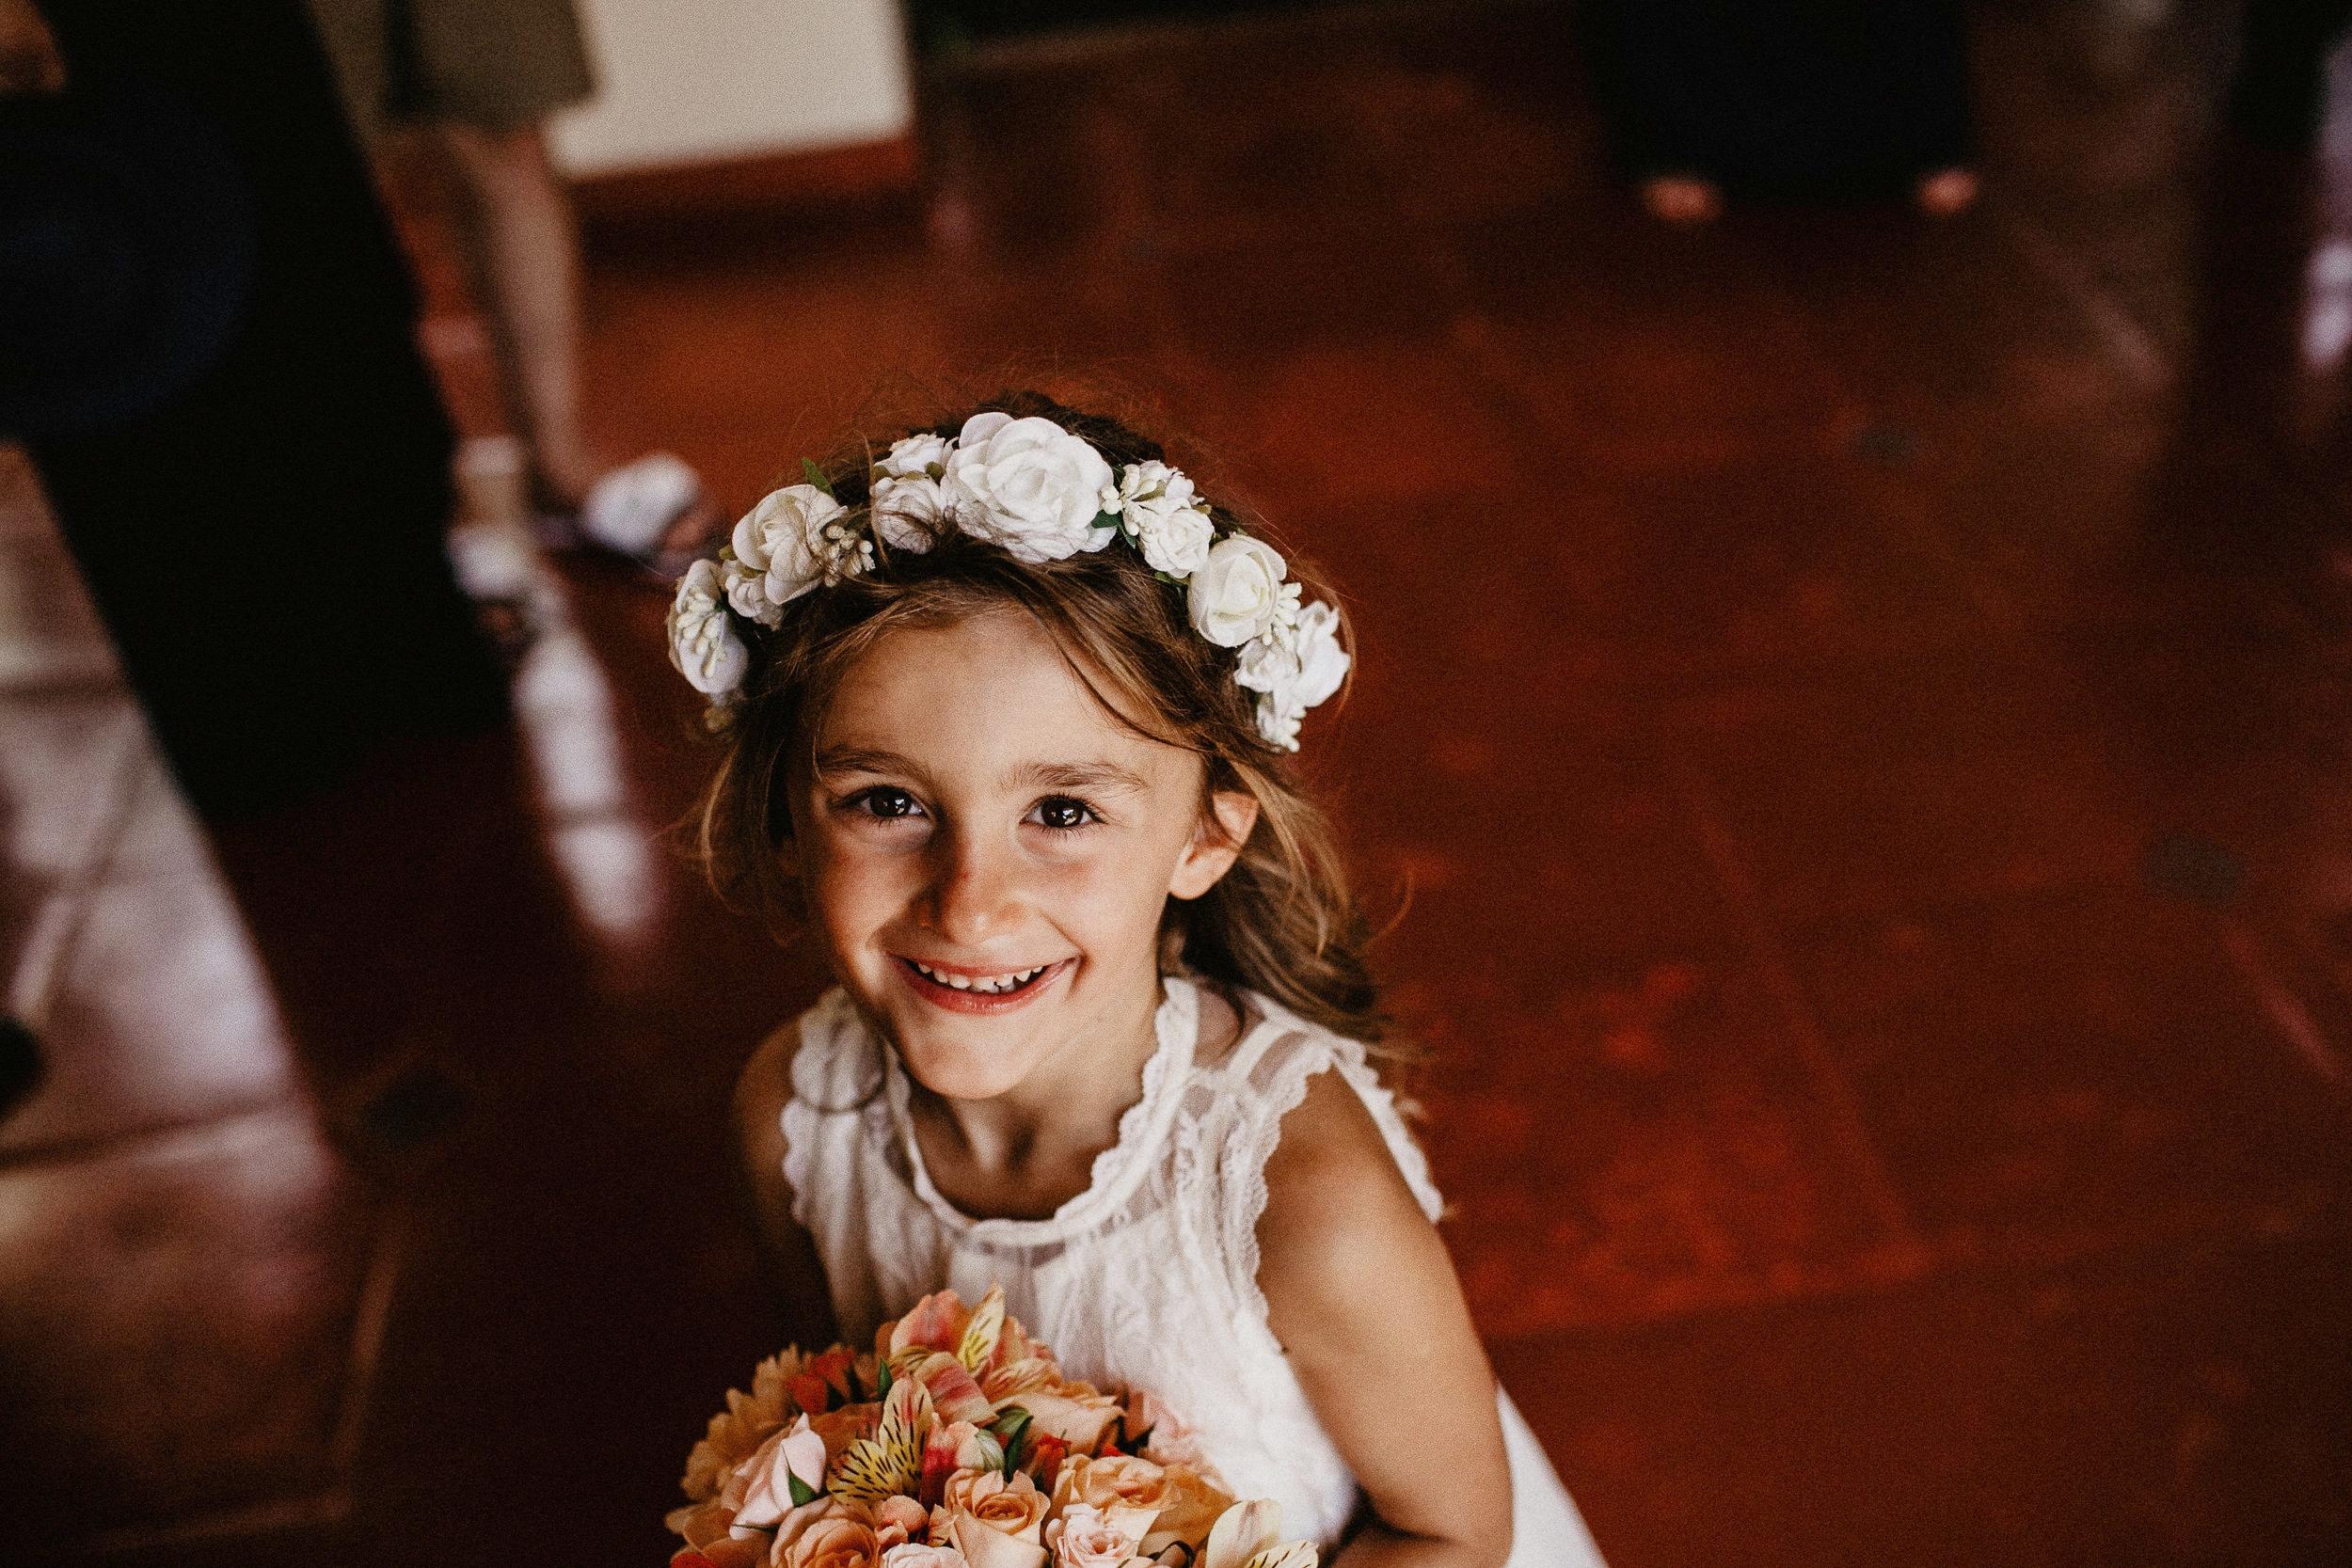 alfonso_flores_destination_wedding_photography_puerto_vallarta_hotel_barcelo_vallarta_cuttler_amela-445.JPG